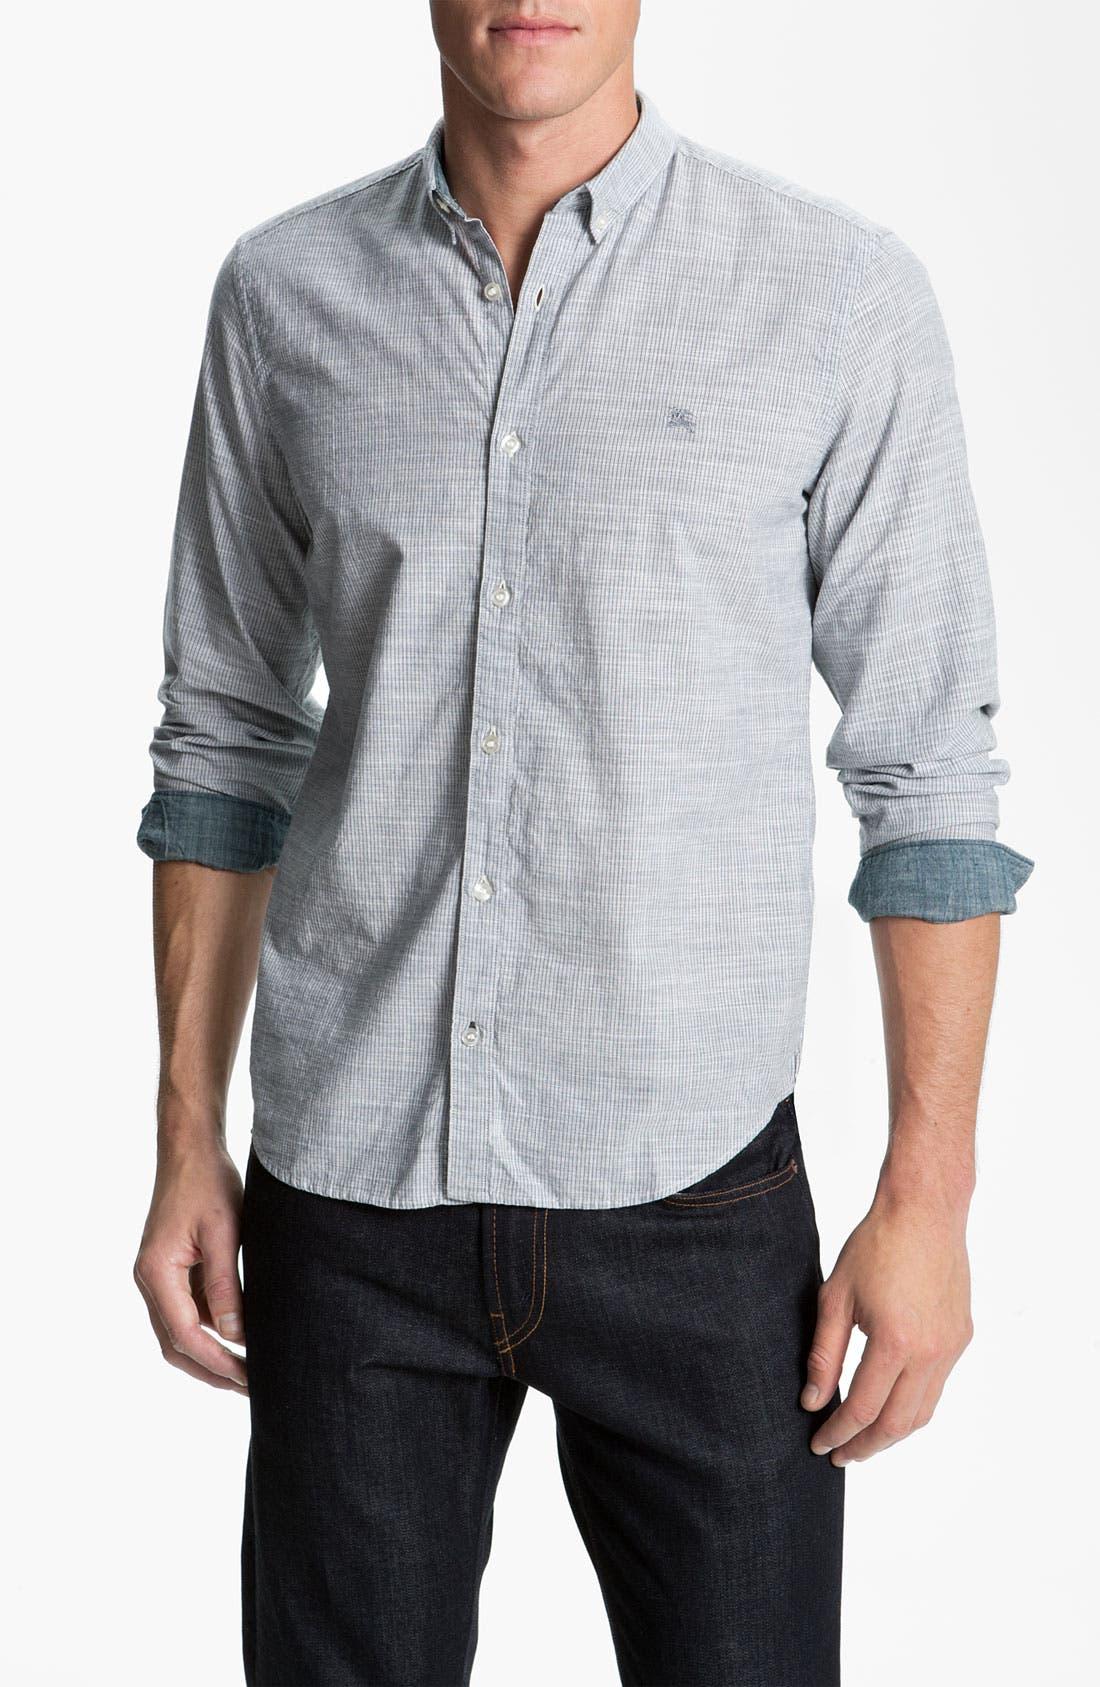 Main Image - Burberry Brit Trim Fit Sport Shirt